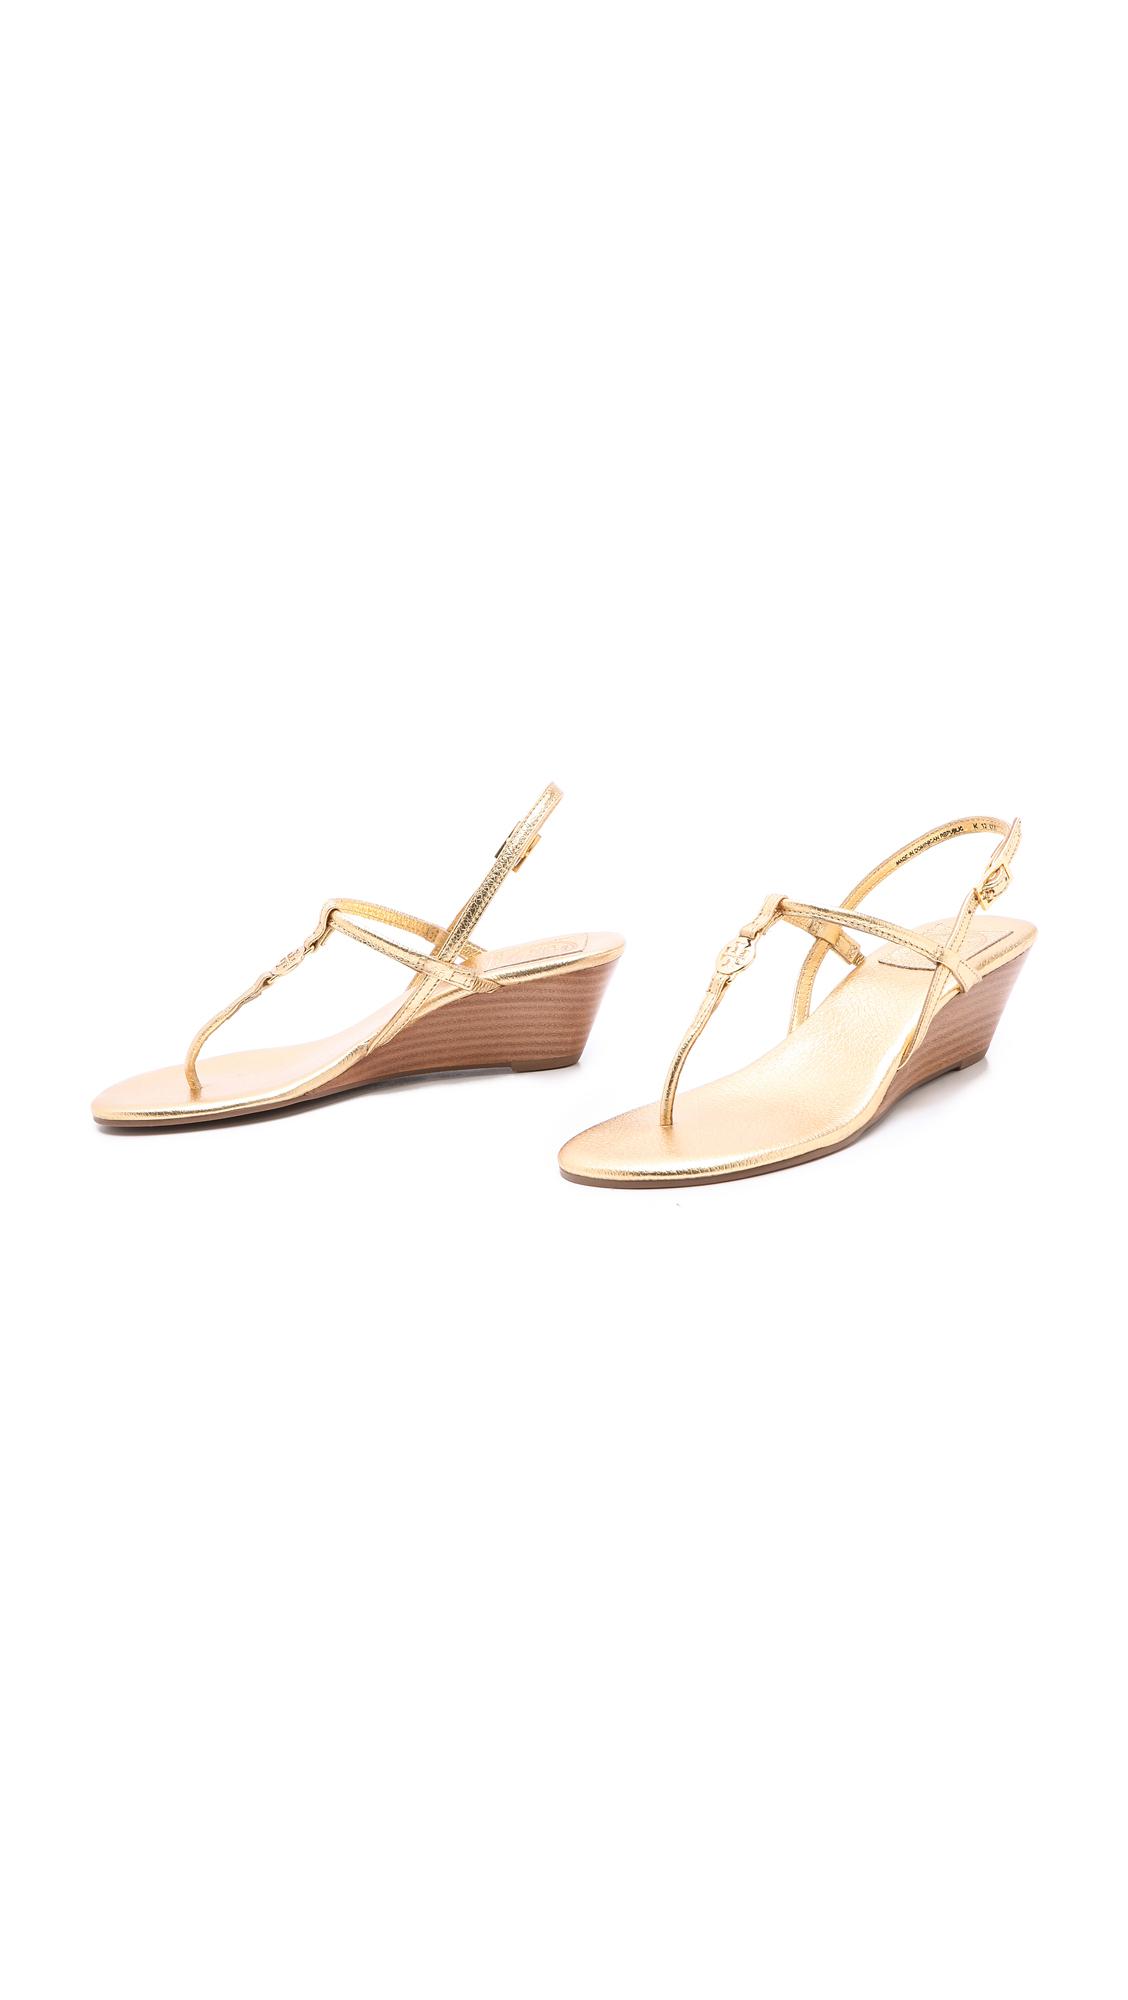 b645fb87e Tory Burch Emmy Demi Wedge Sandals